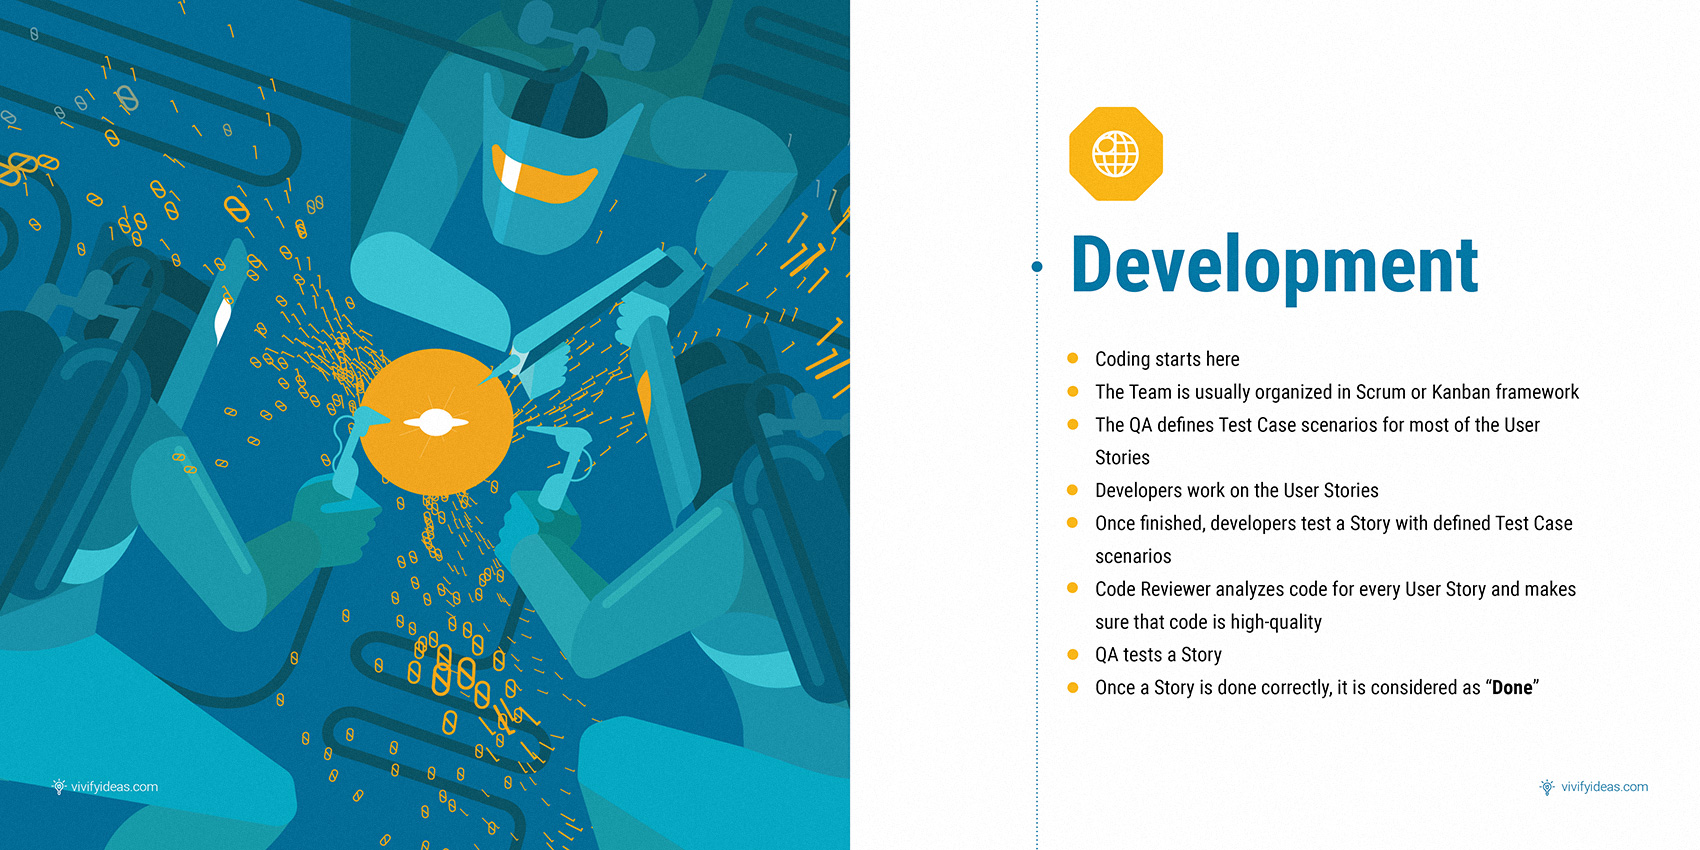 Project-Development-Lifecycle Development.jpg